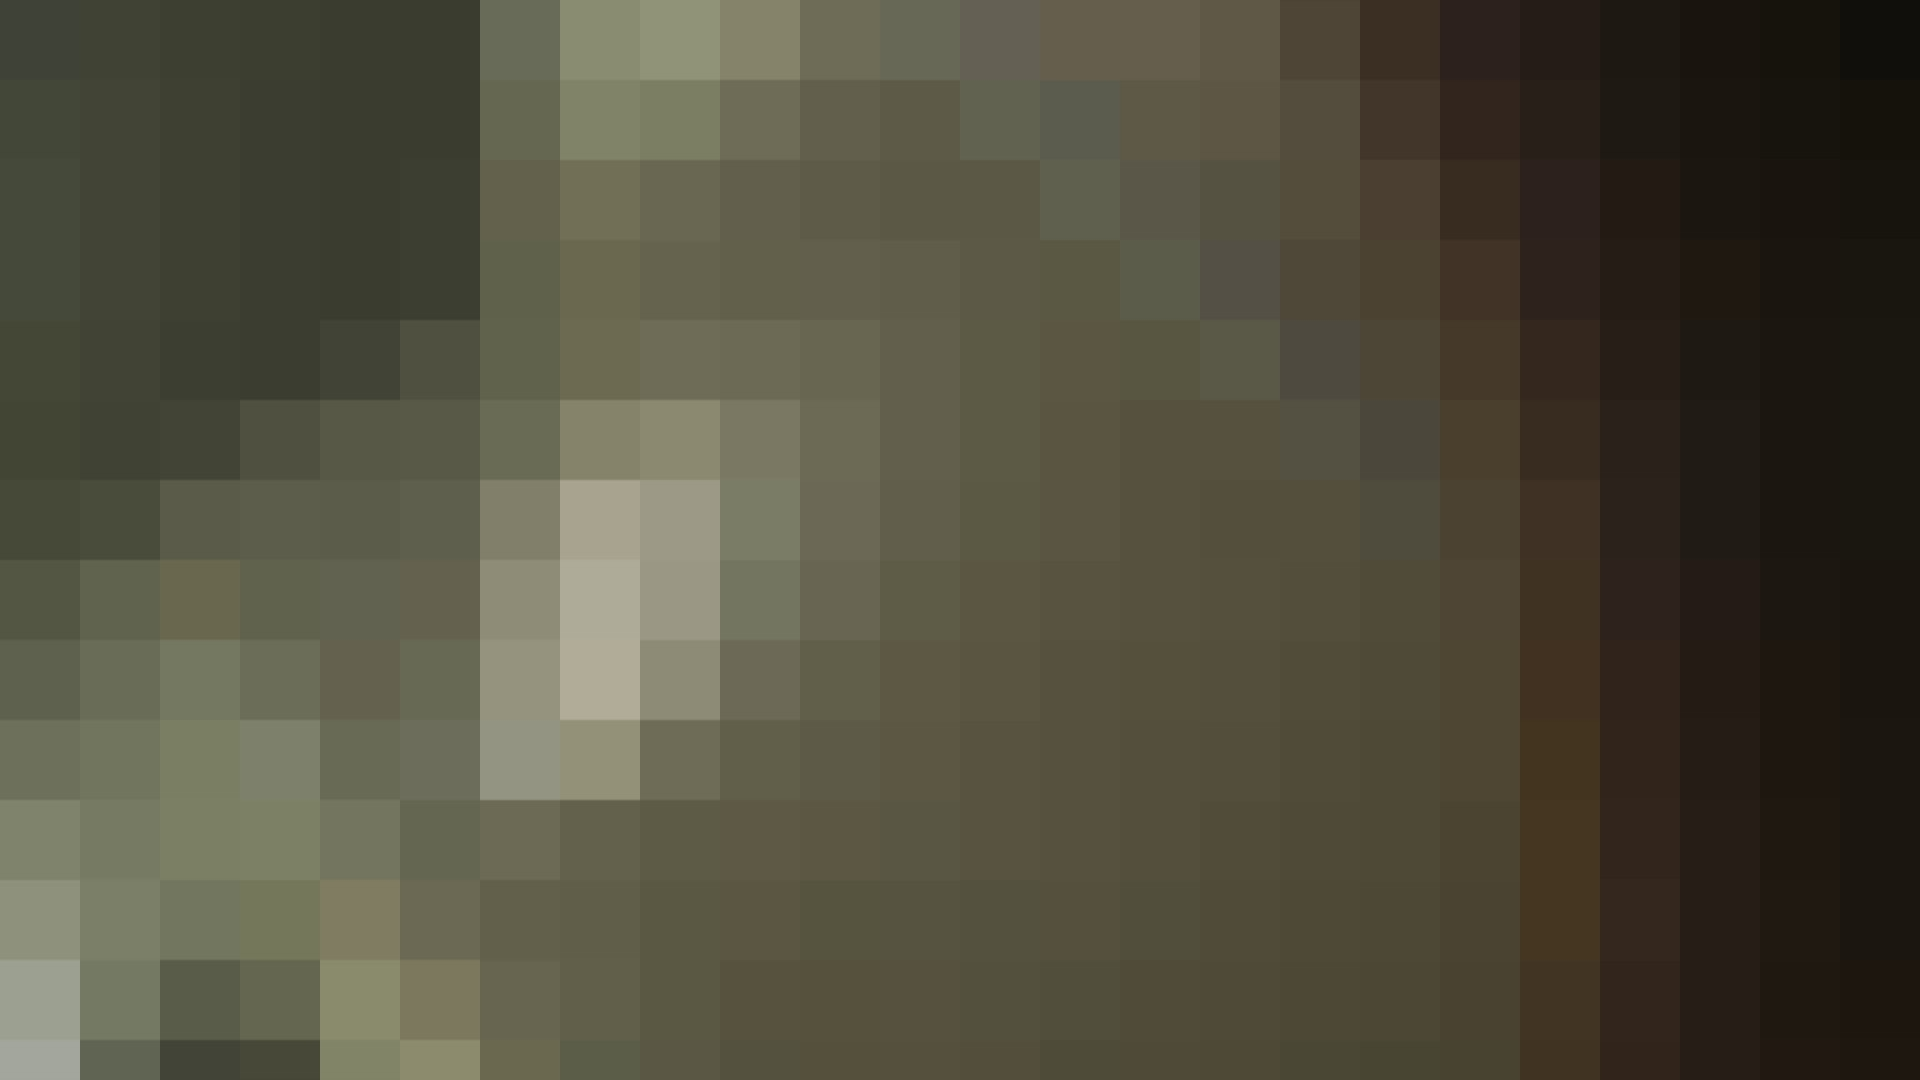 vol.25三十時間潜り、一つしか出会えない完璧桃尻編 byお銀 OL女体 スケベ動画紹介 61連発 38